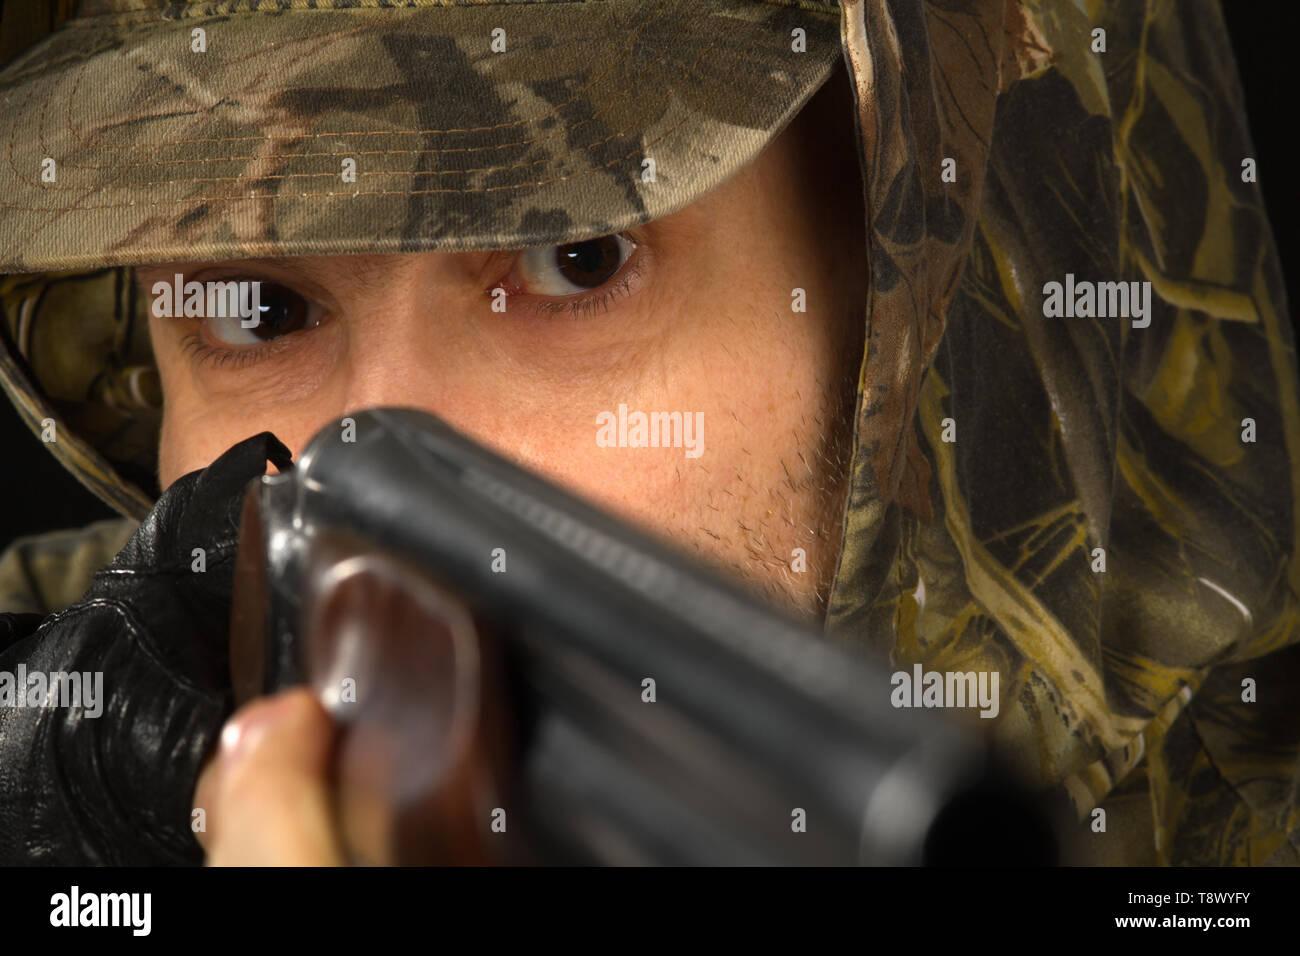 eyes of a hunter aiming with a shotgun, closeup - Stock Image